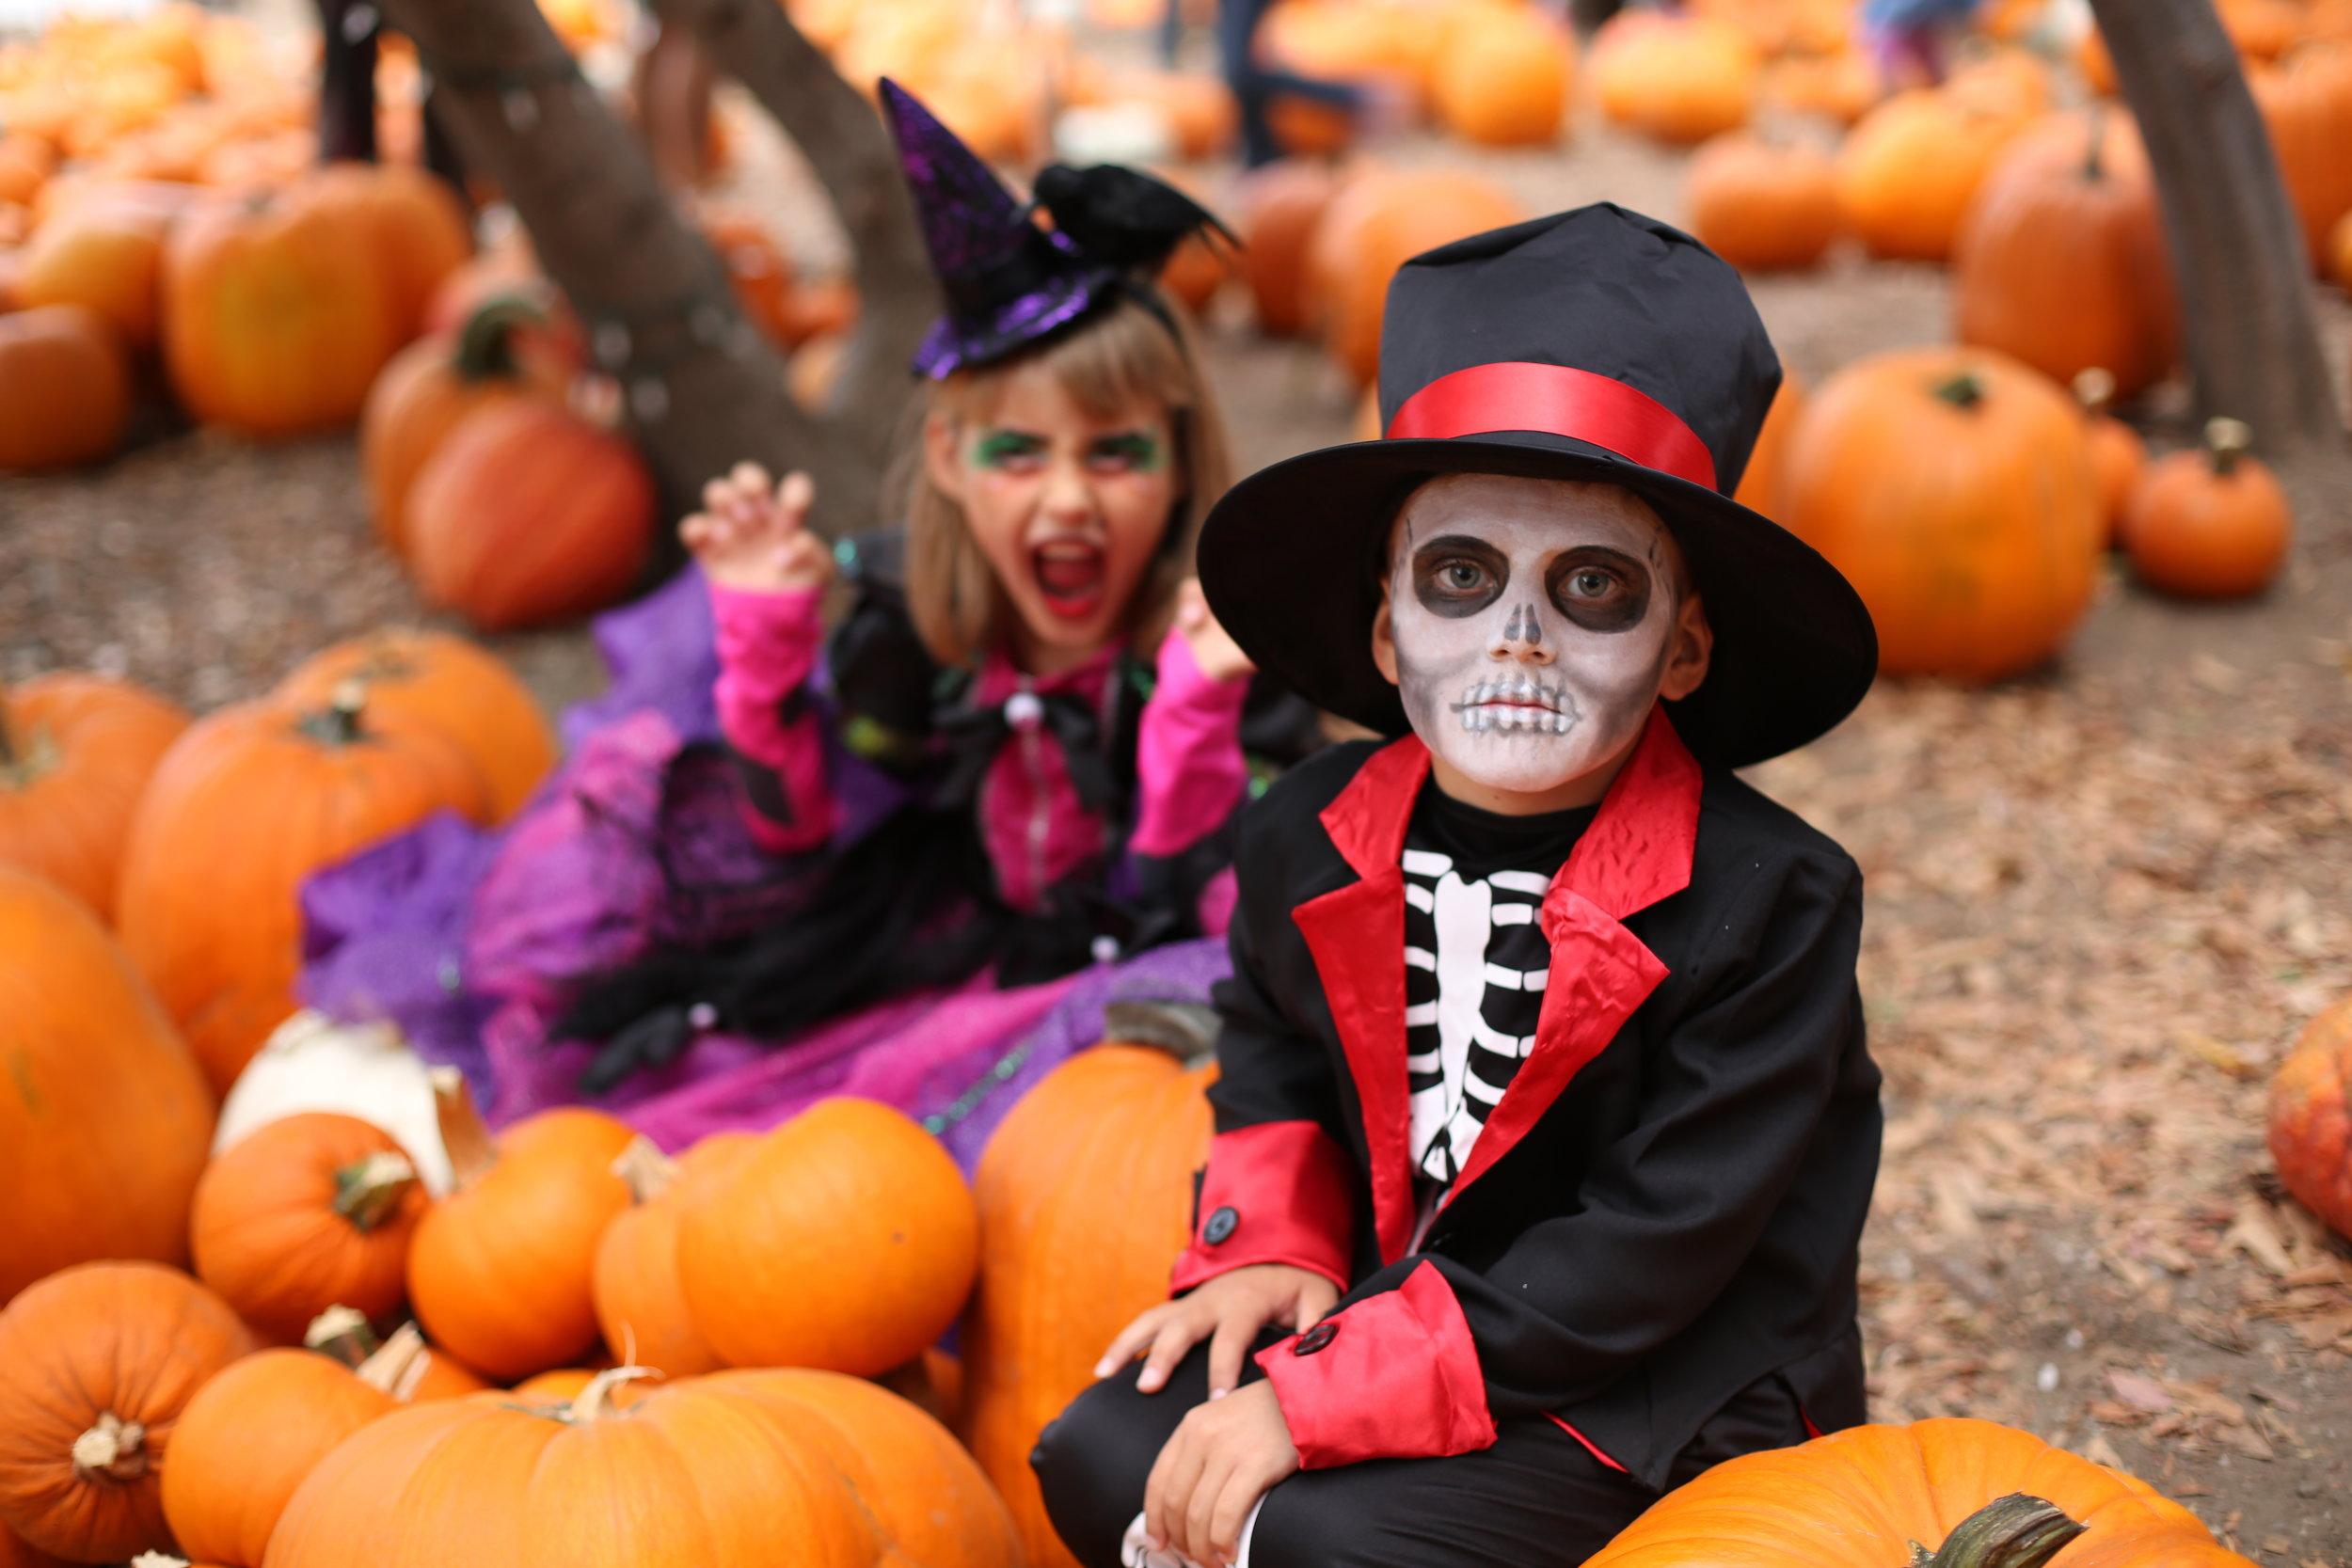 Kids on Pumpkins.jpg